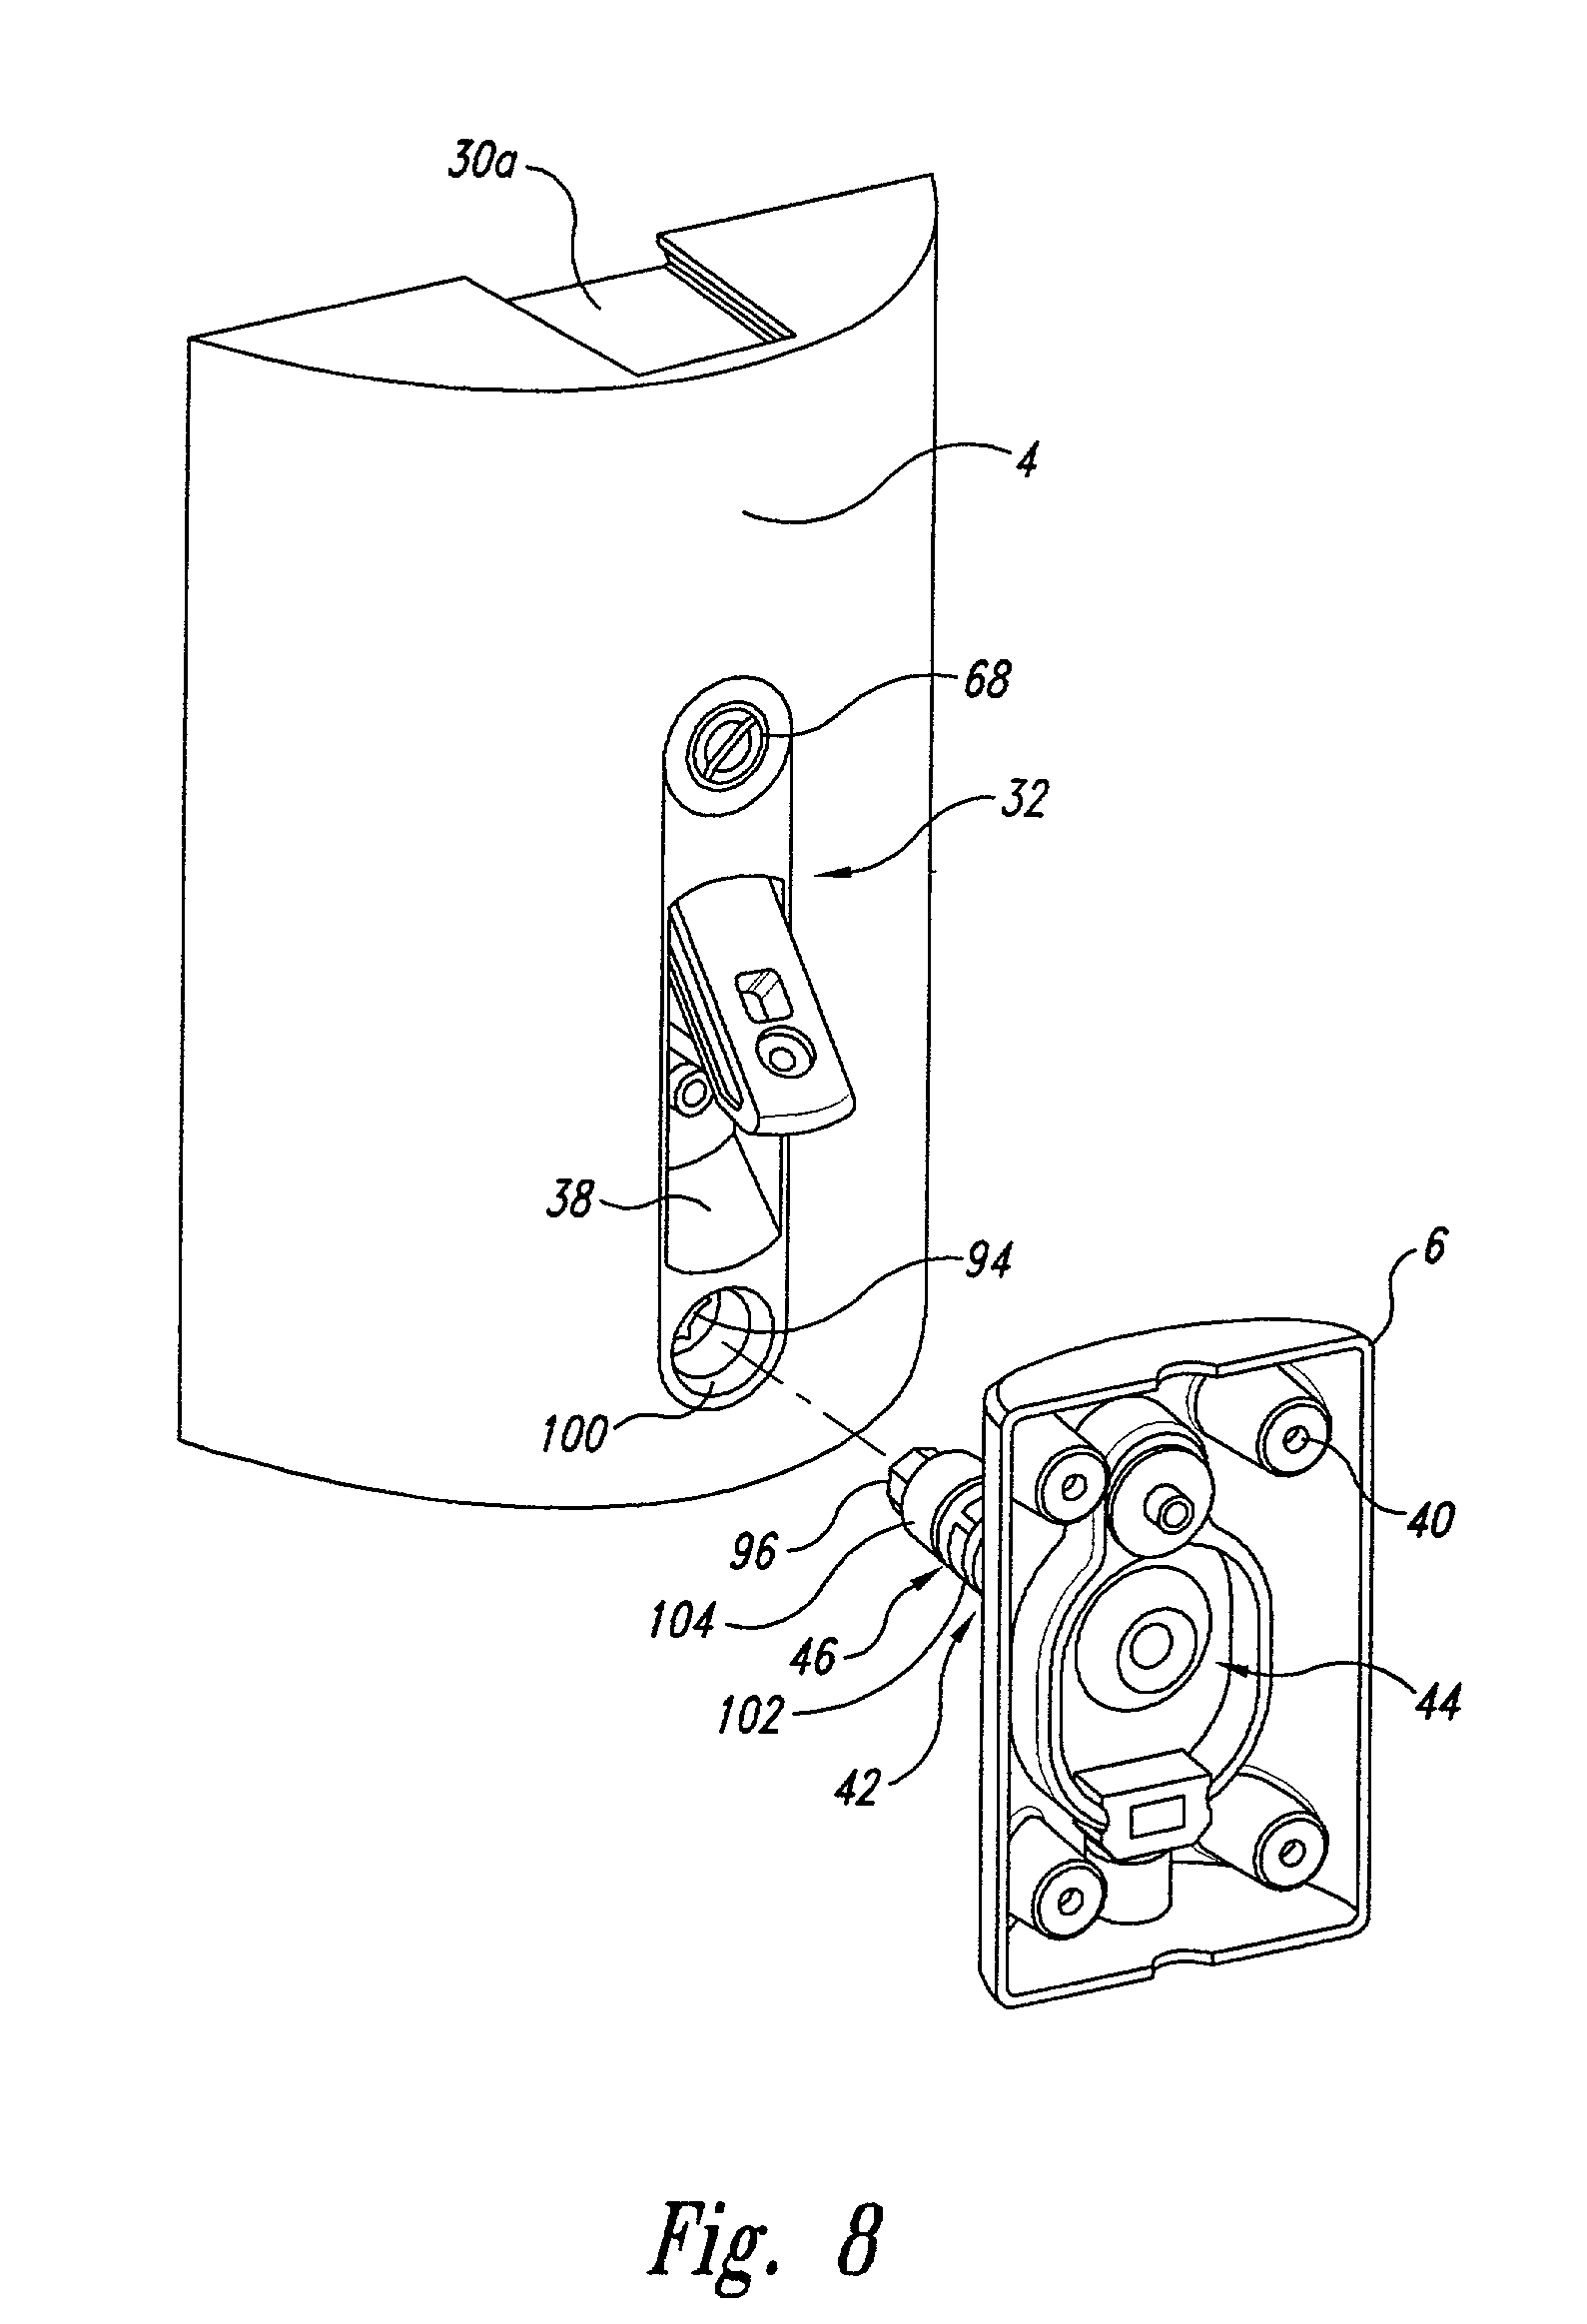 clarion vx401 wiring diagram ge washer marine audio imageresizertool com